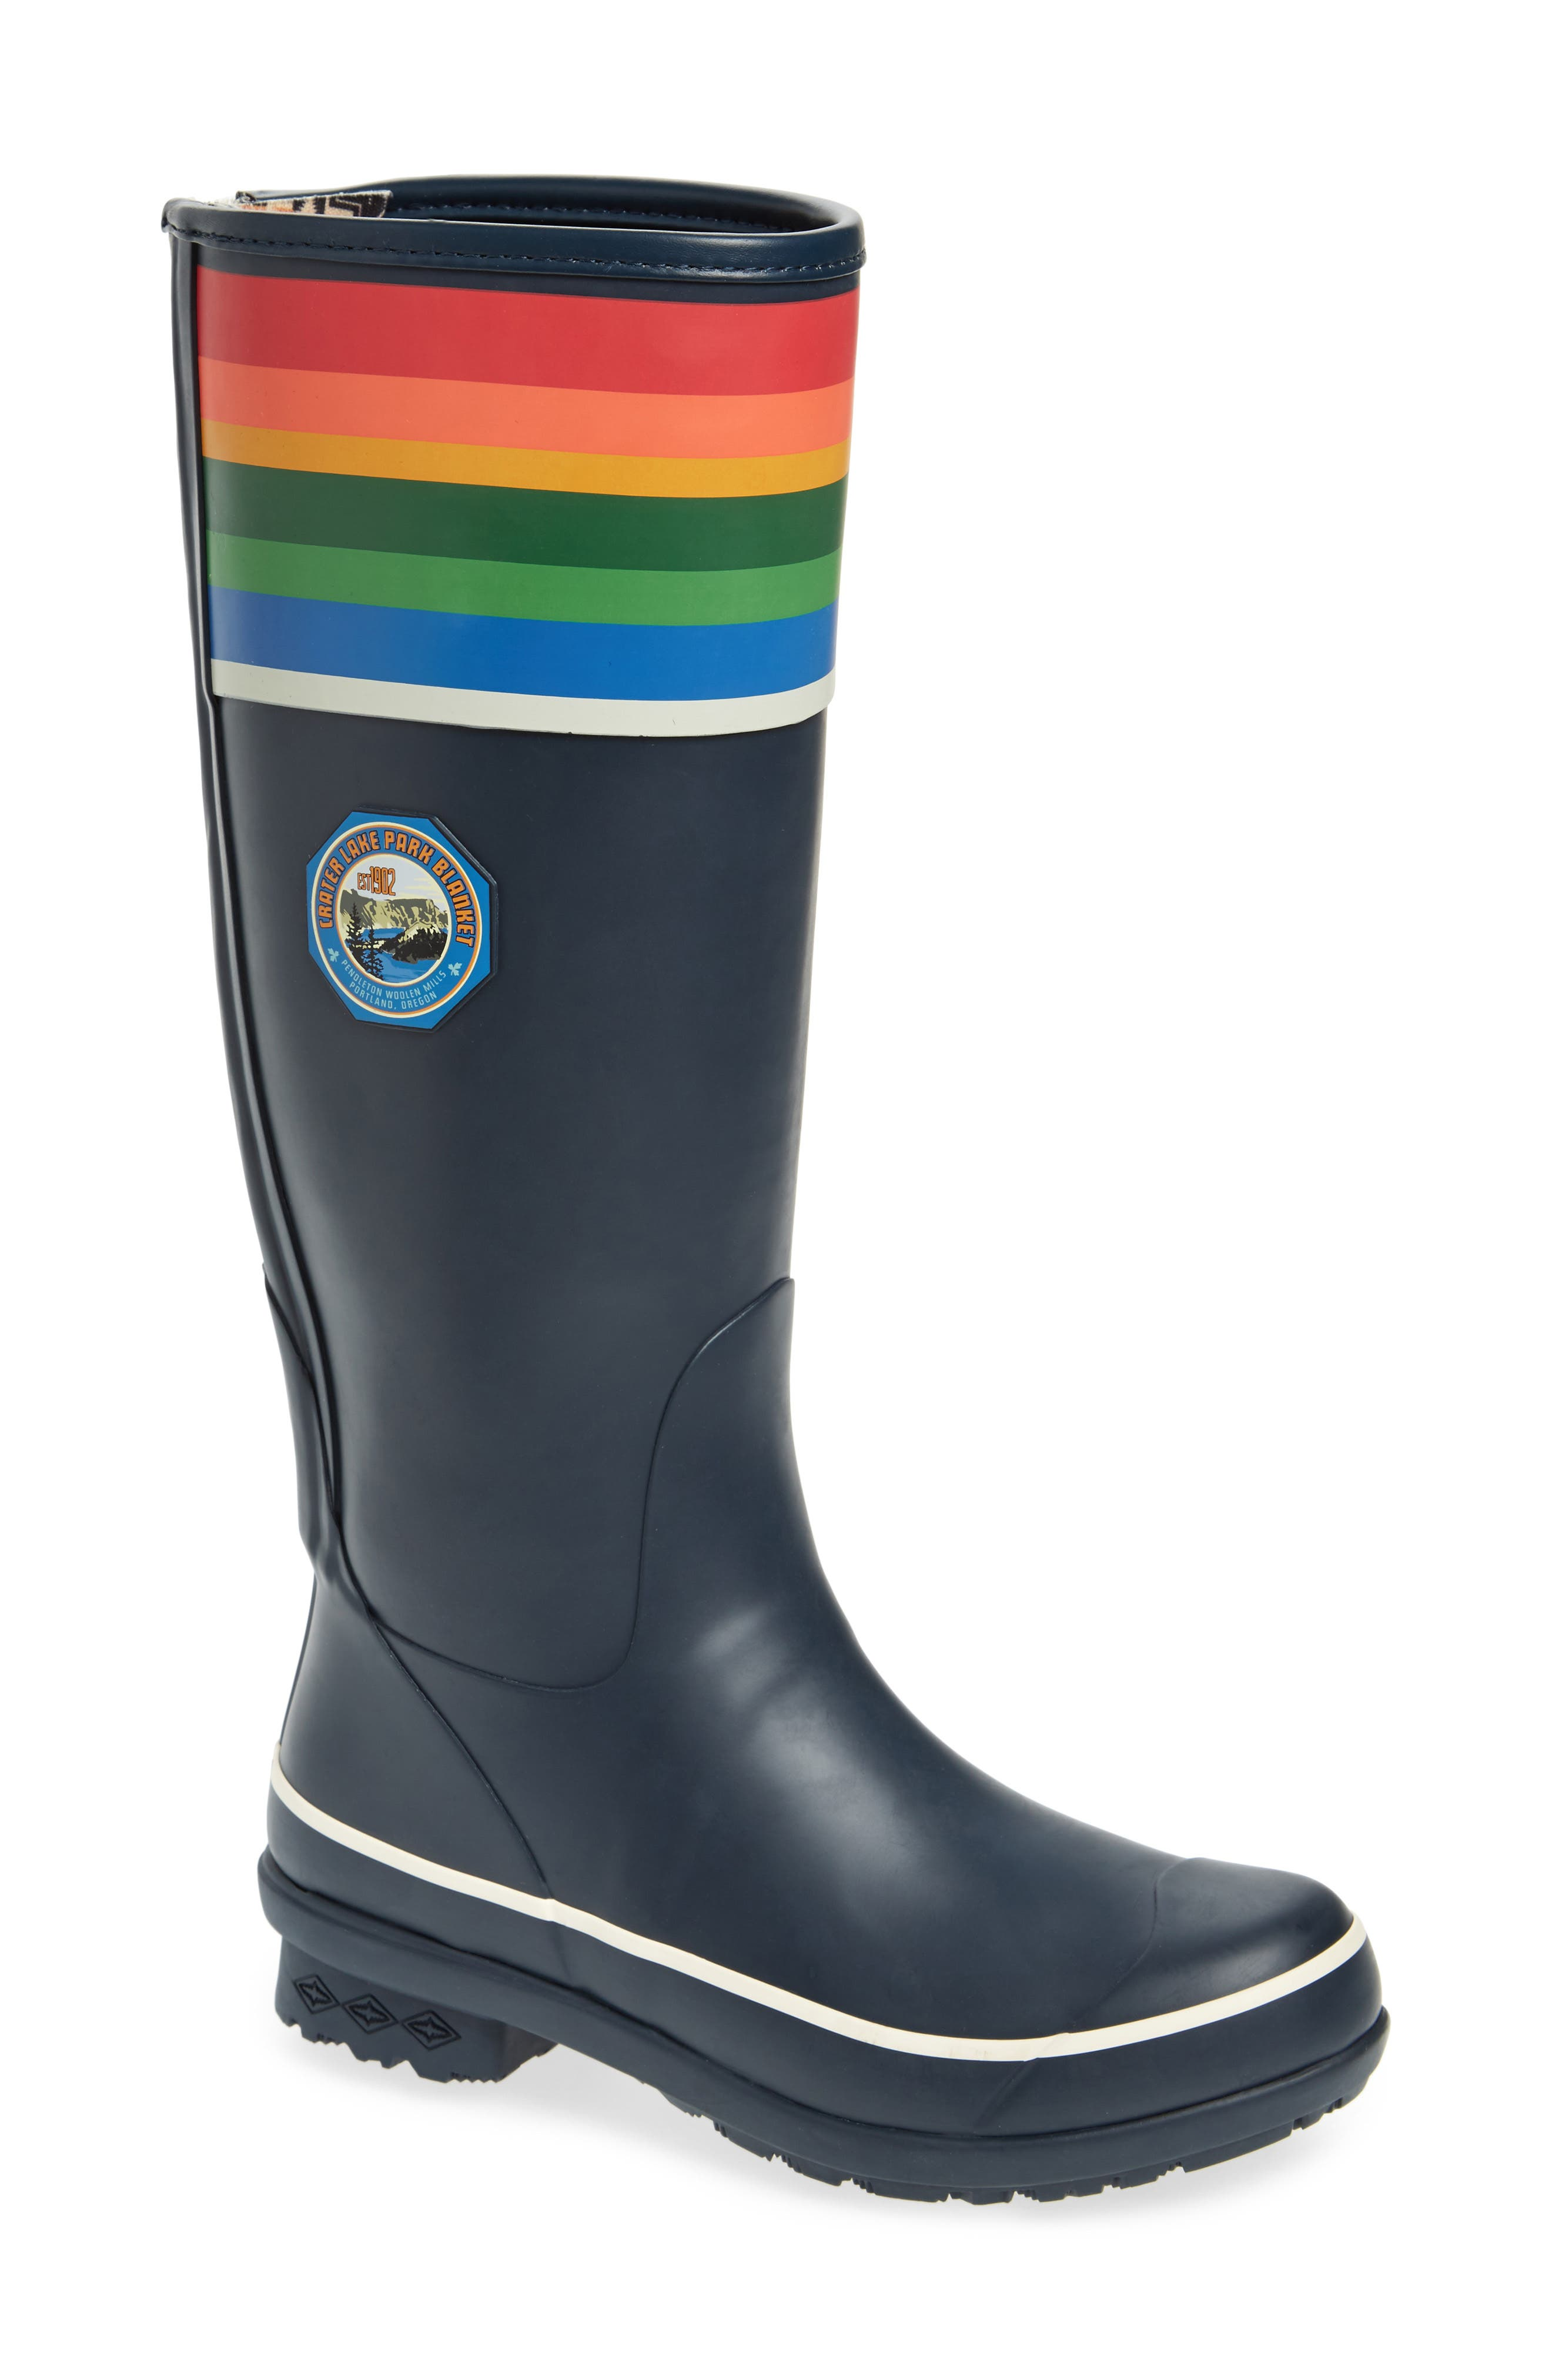 Main Image - Pendleton Crater Lake National Park Tall Rain Boot (Women)